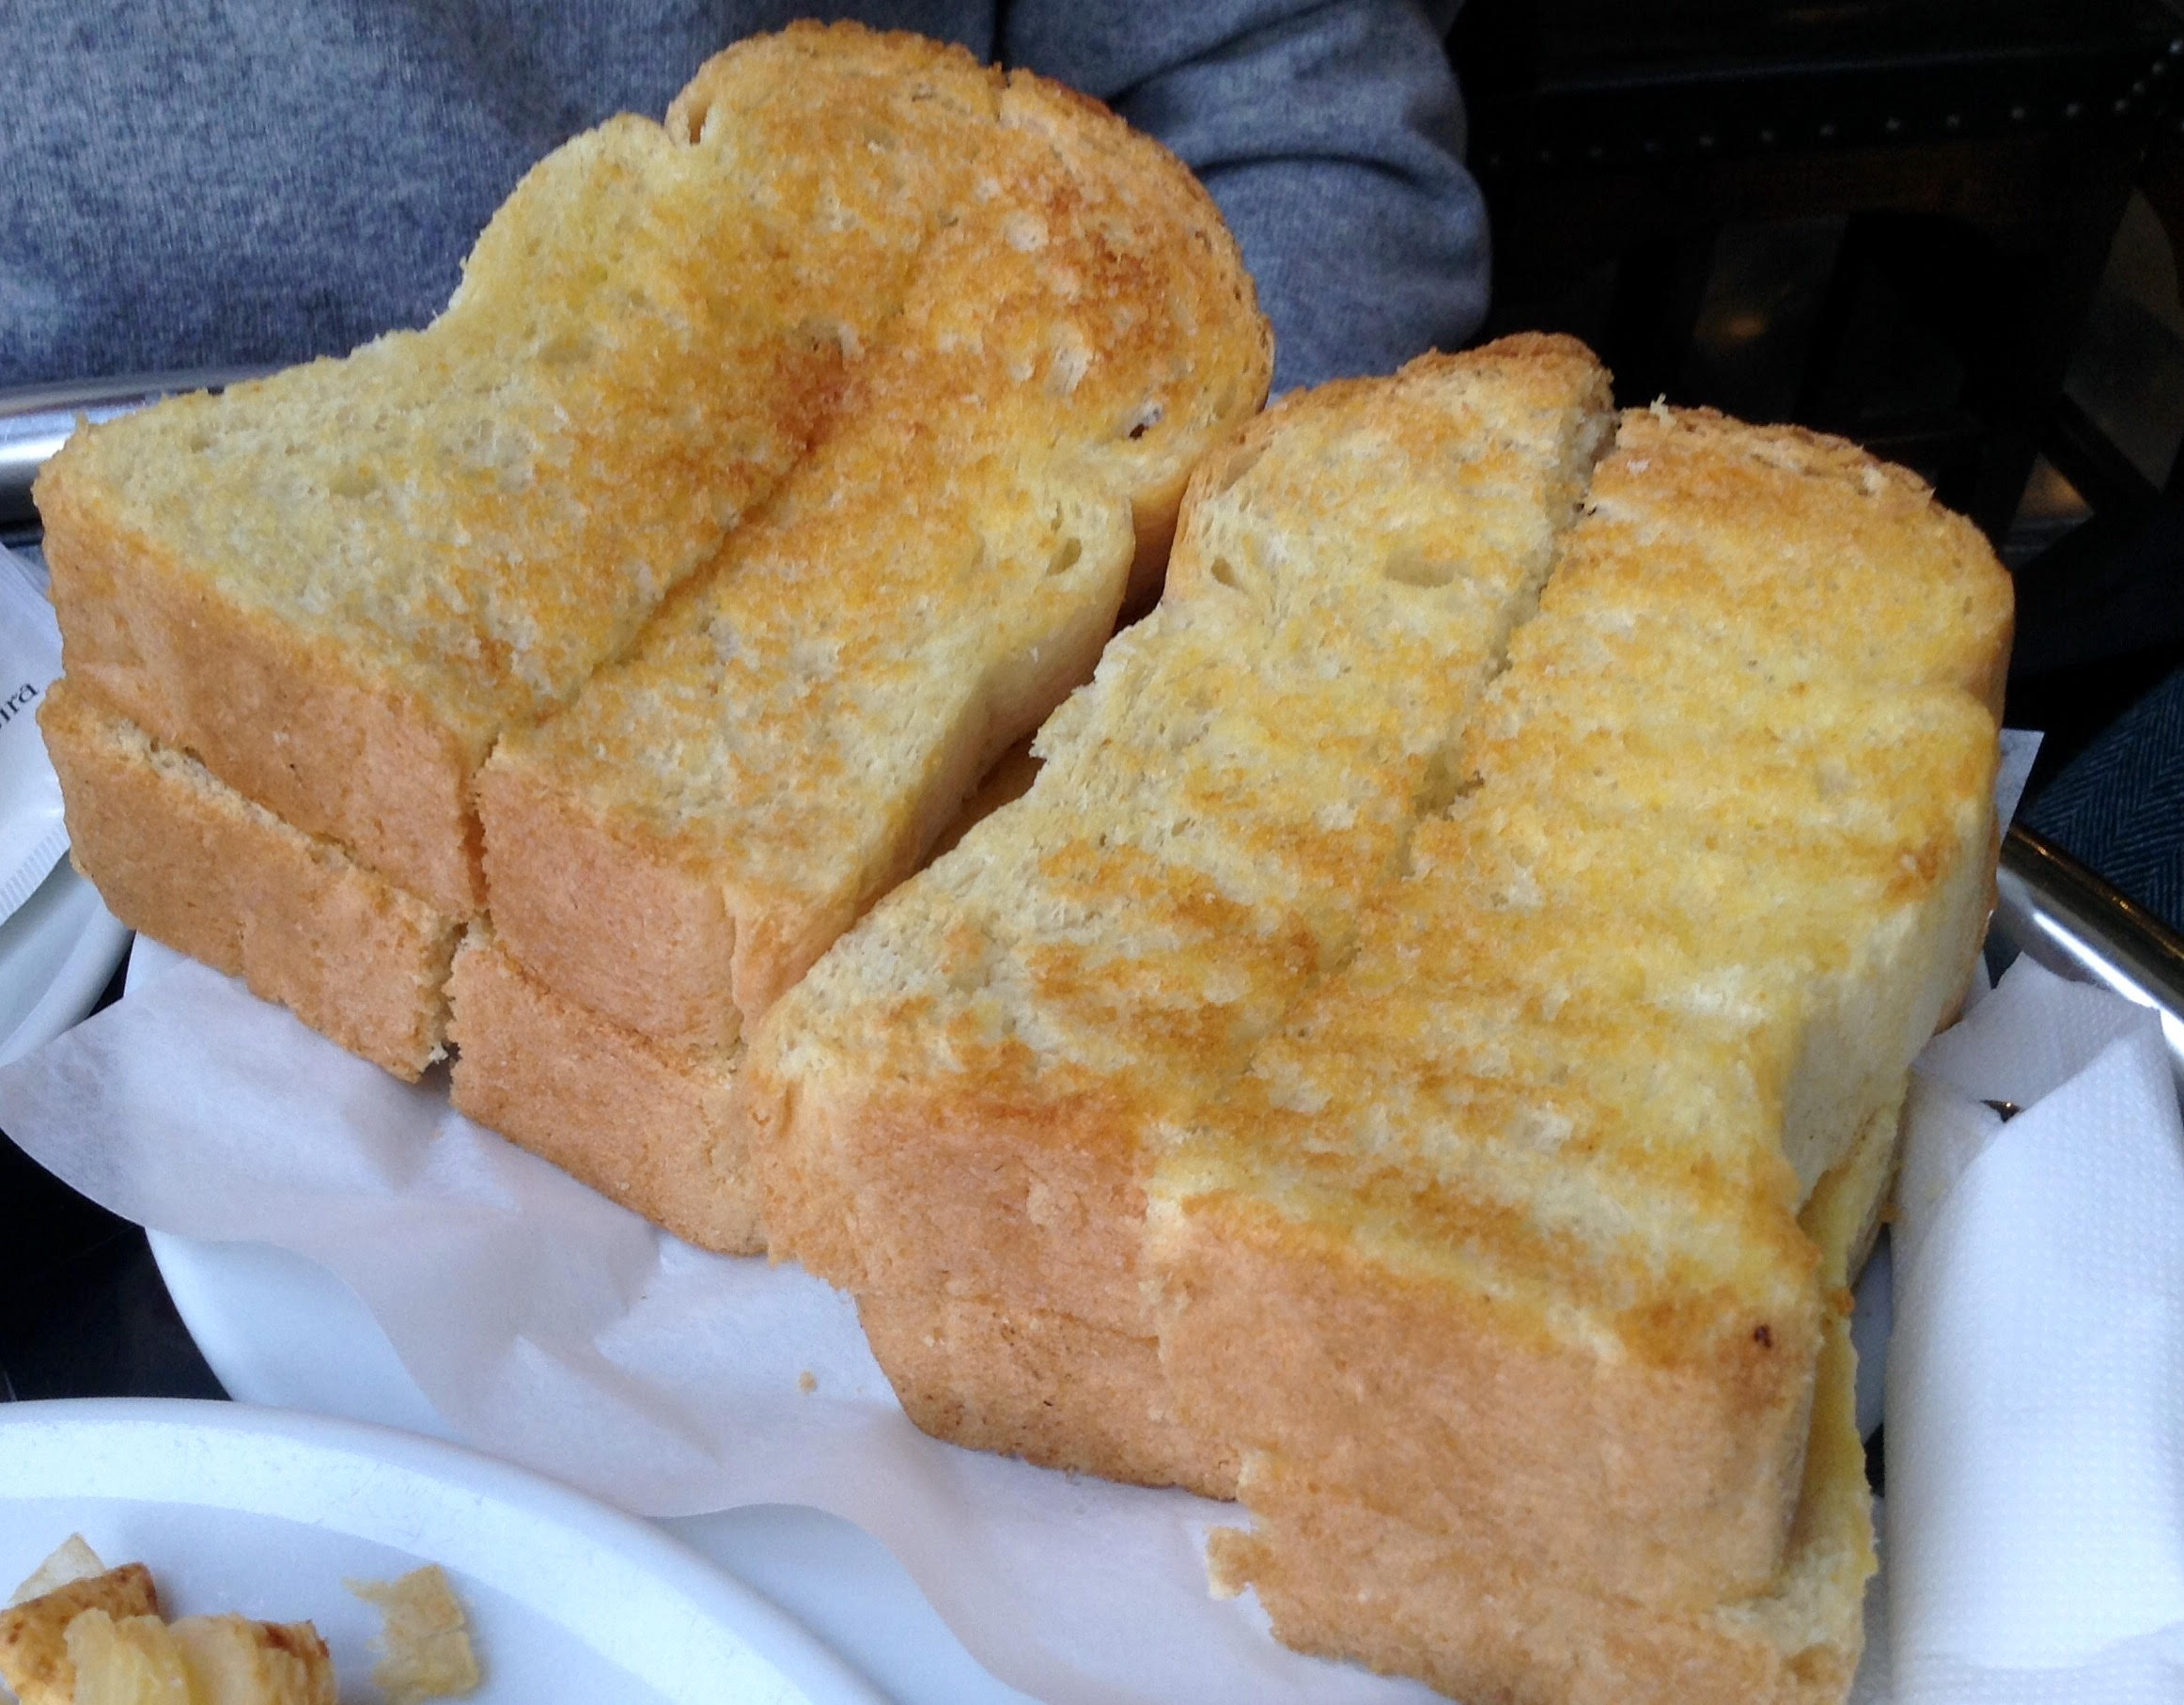 Tostadas para merendar con mantequilla